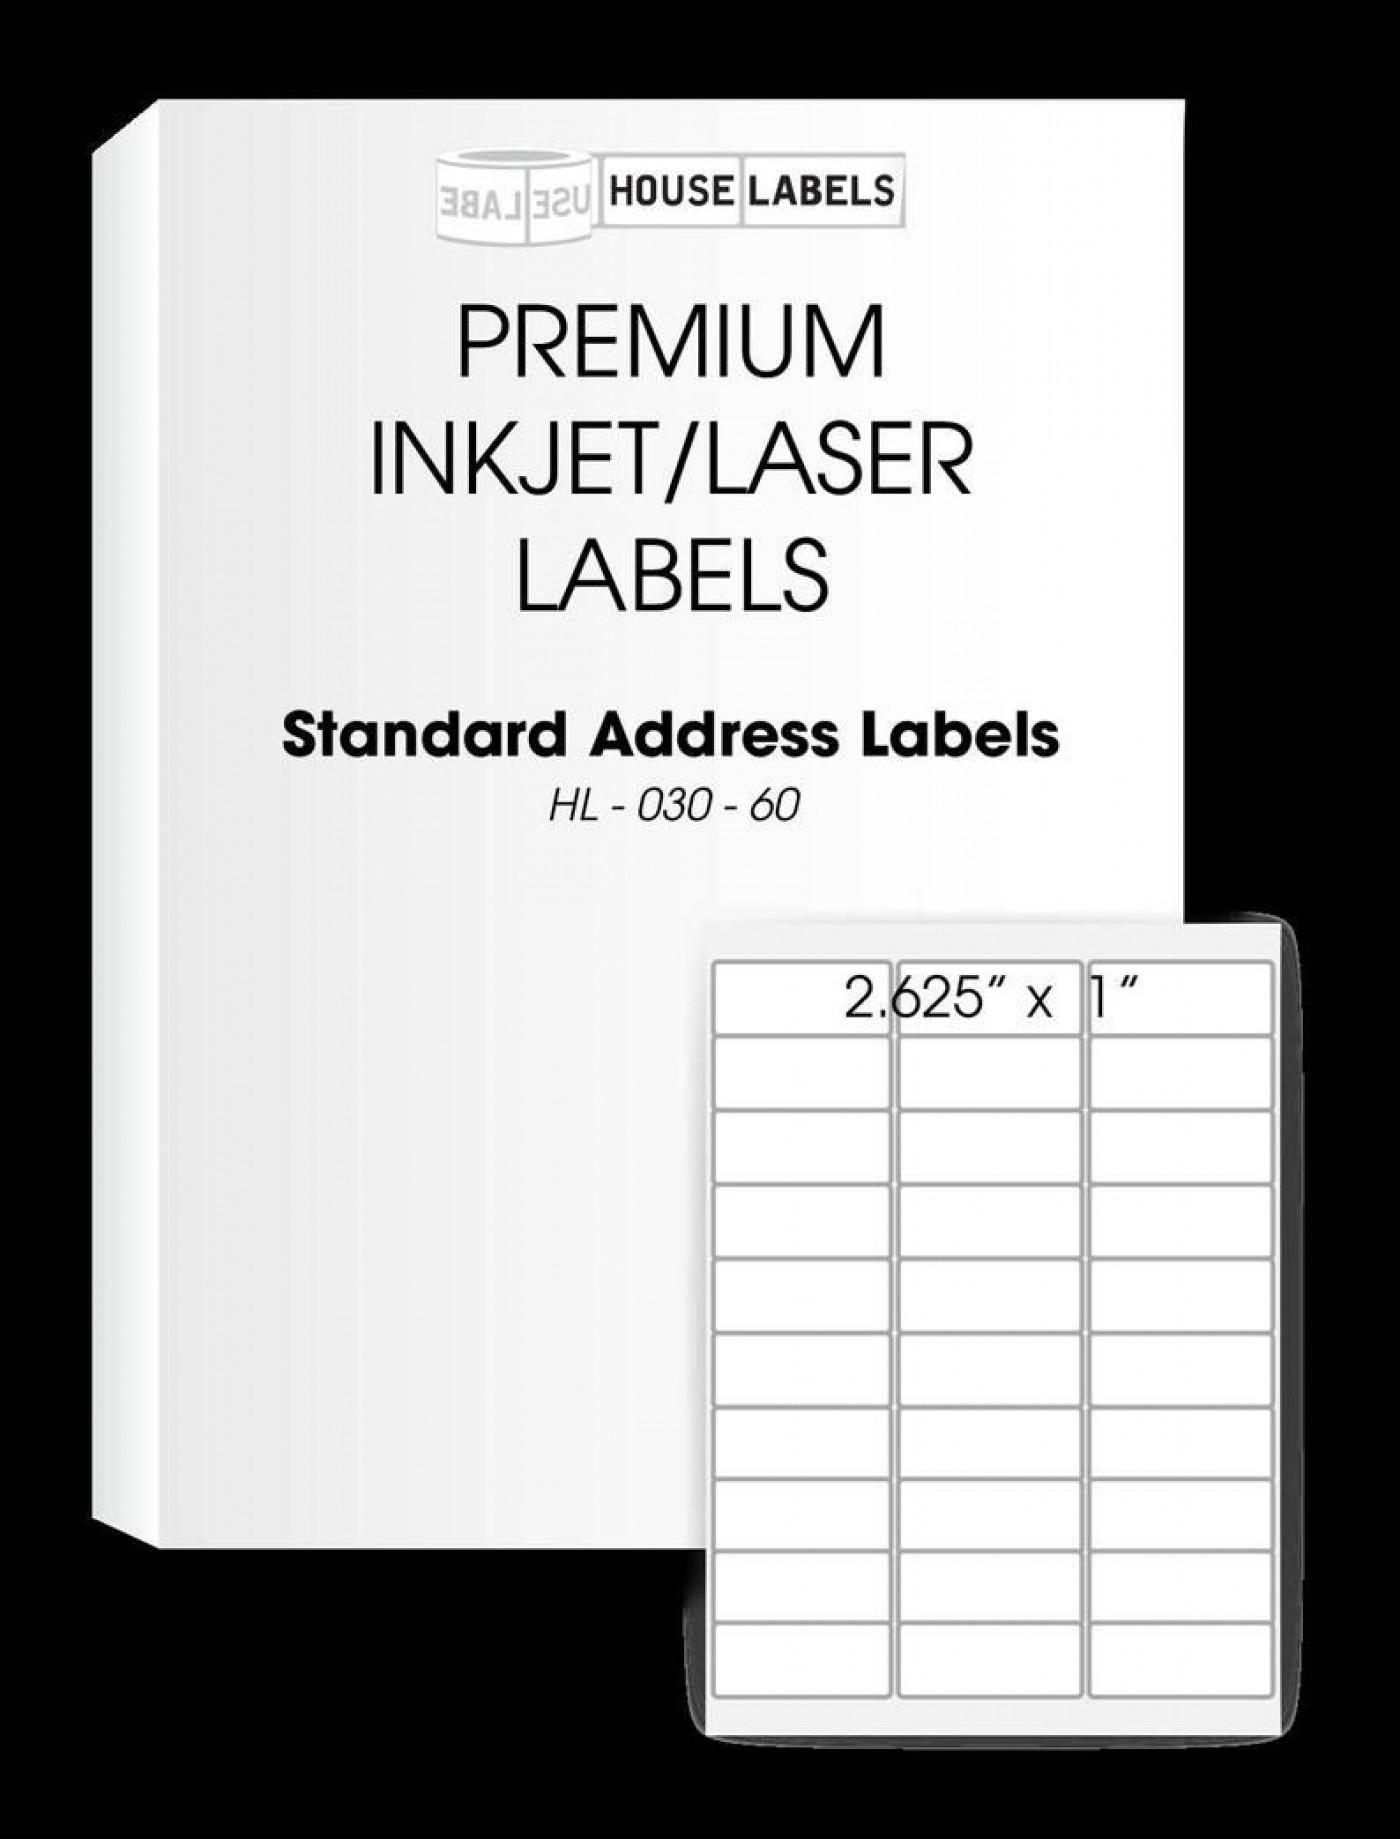 008 Unbelievable Free Return Addres Label Template 60 Per Sheet High Resolution 1400